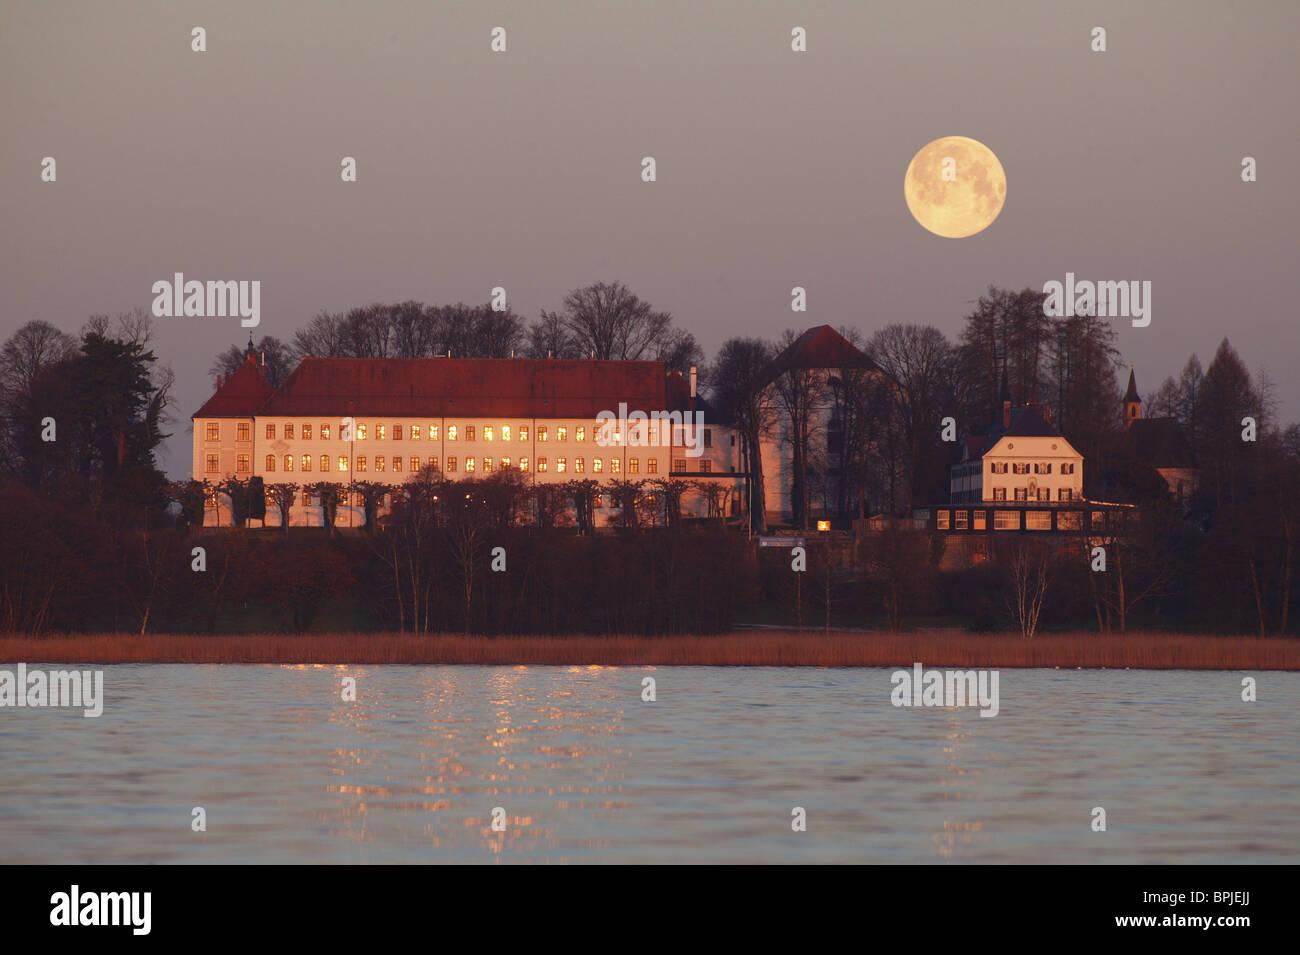 Rising moon over the old palace of Herrenchiemsee, Herreninsel, Lake Chiemsee, Chiemgau, Bavaria, Germany - Stock Image